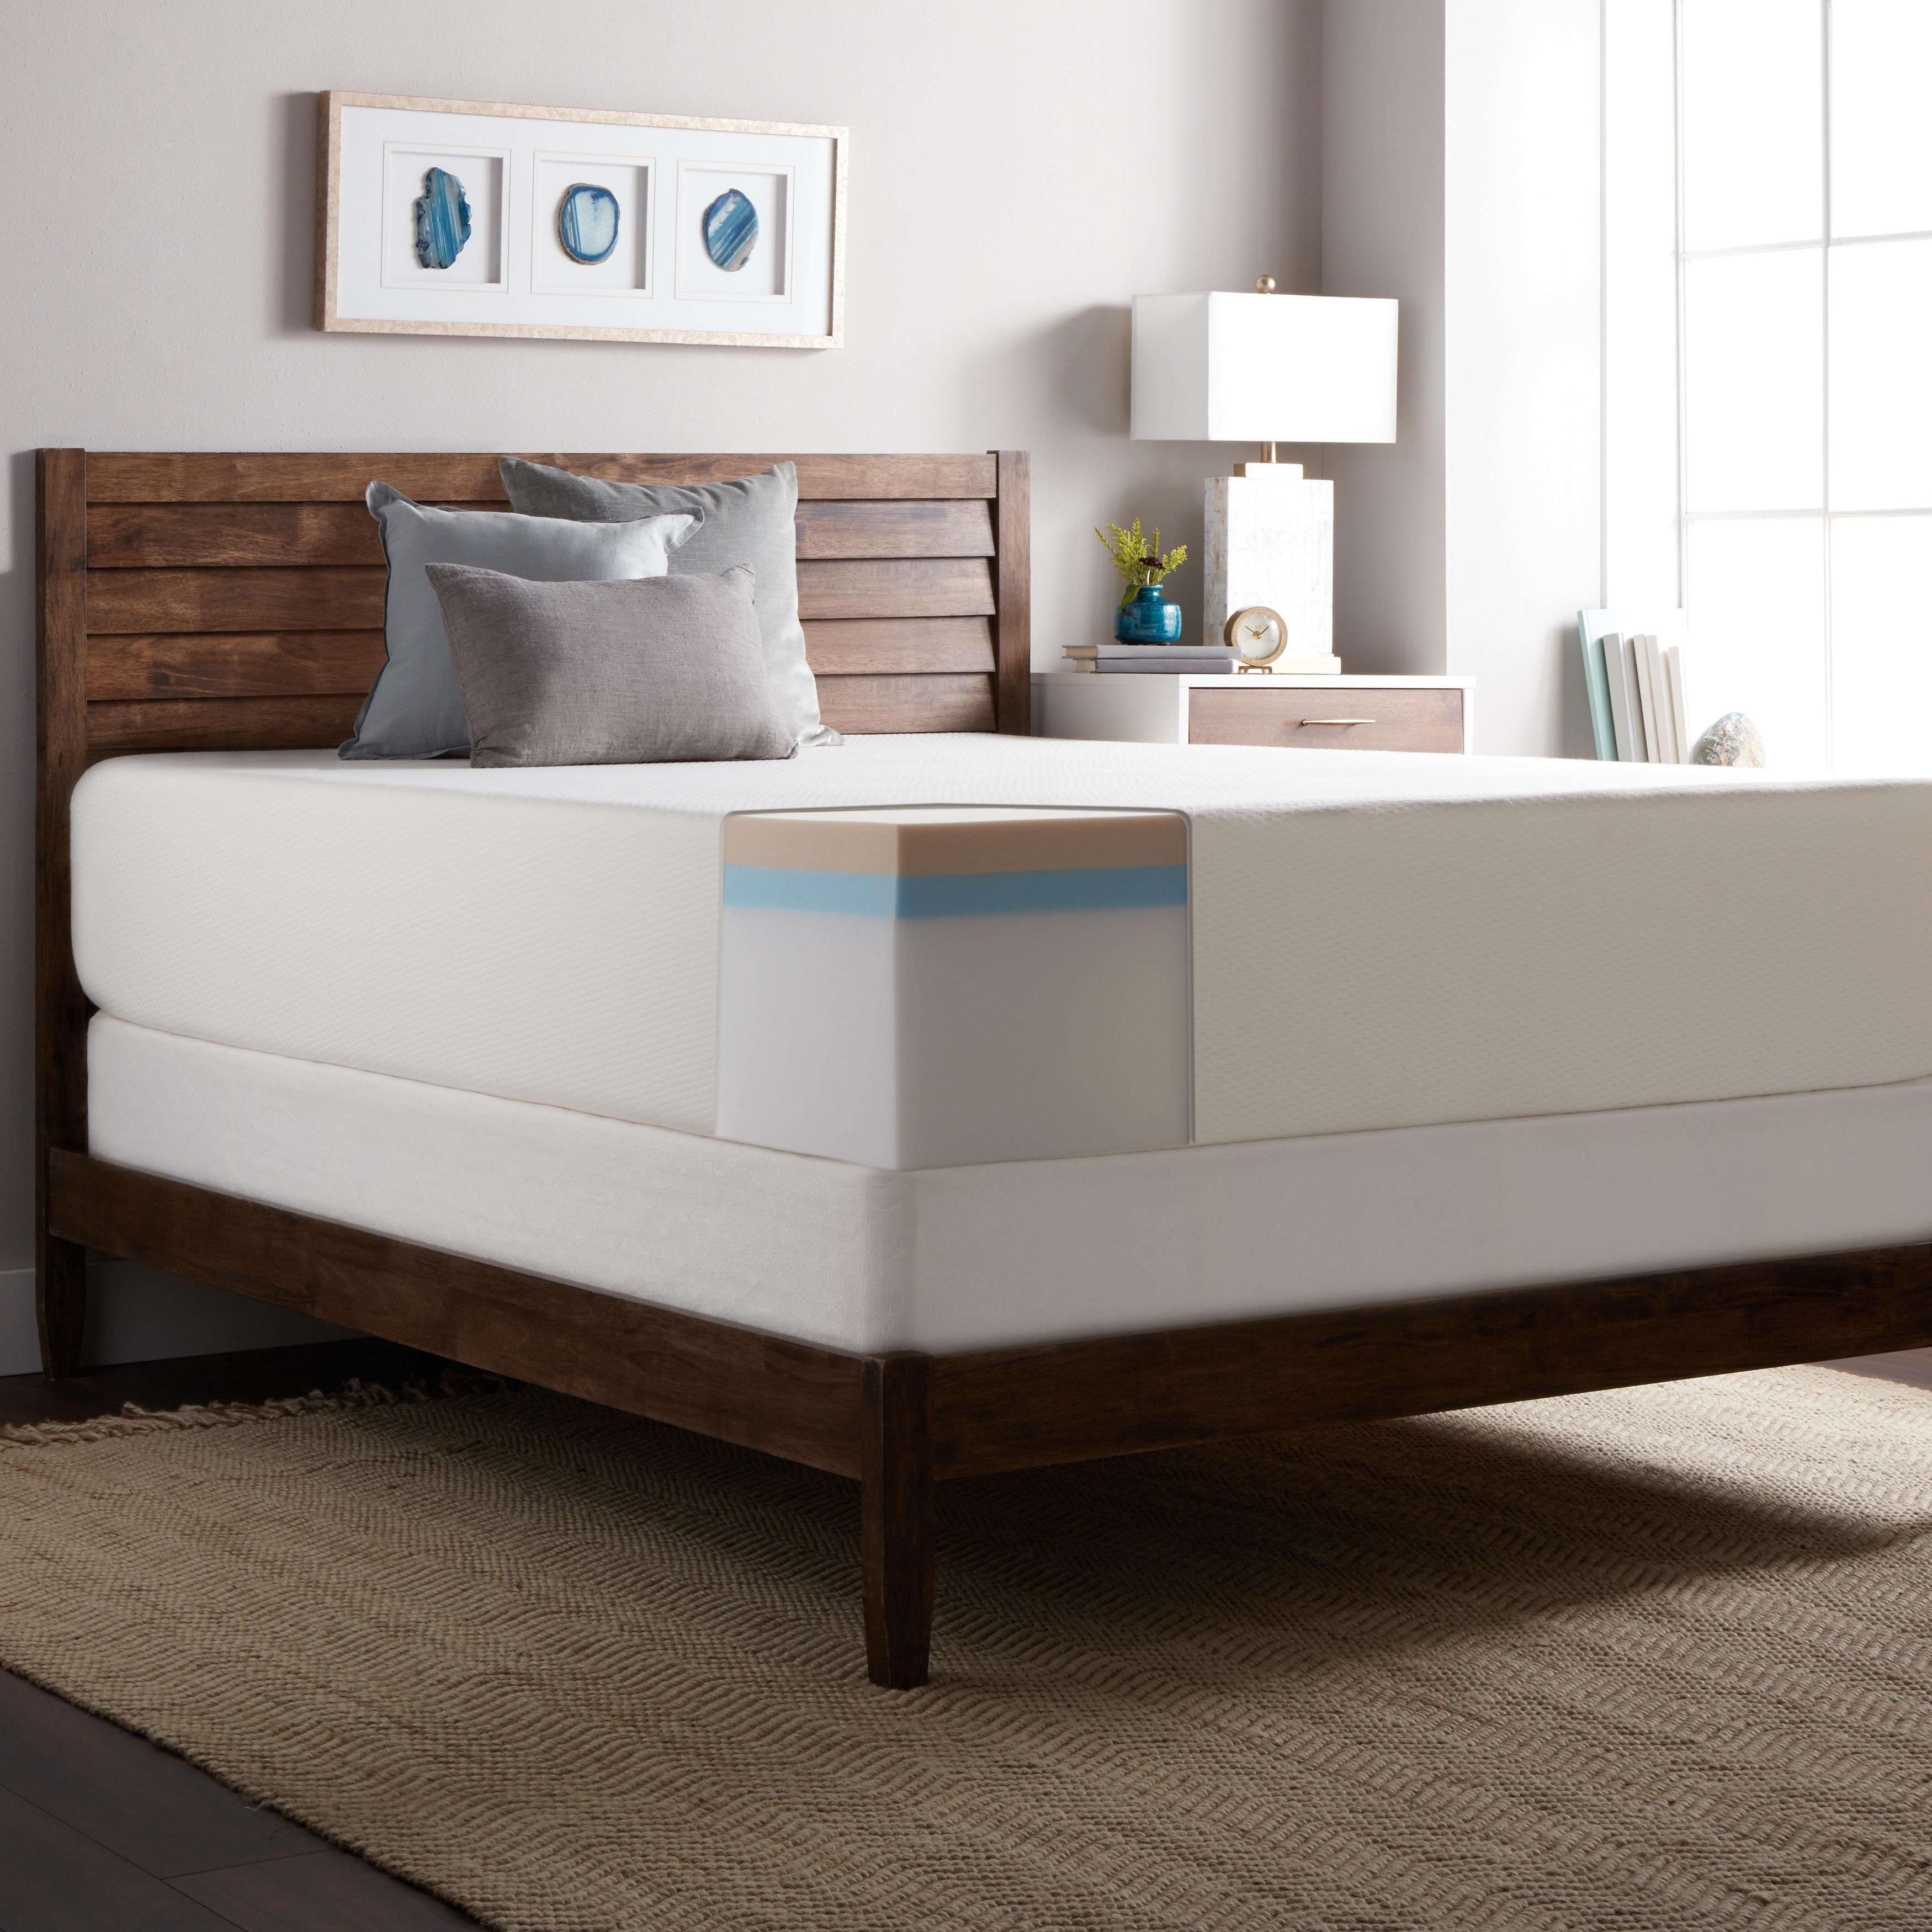 Select Luxury Medium Firm 14-inch King Size Memory Foam M...